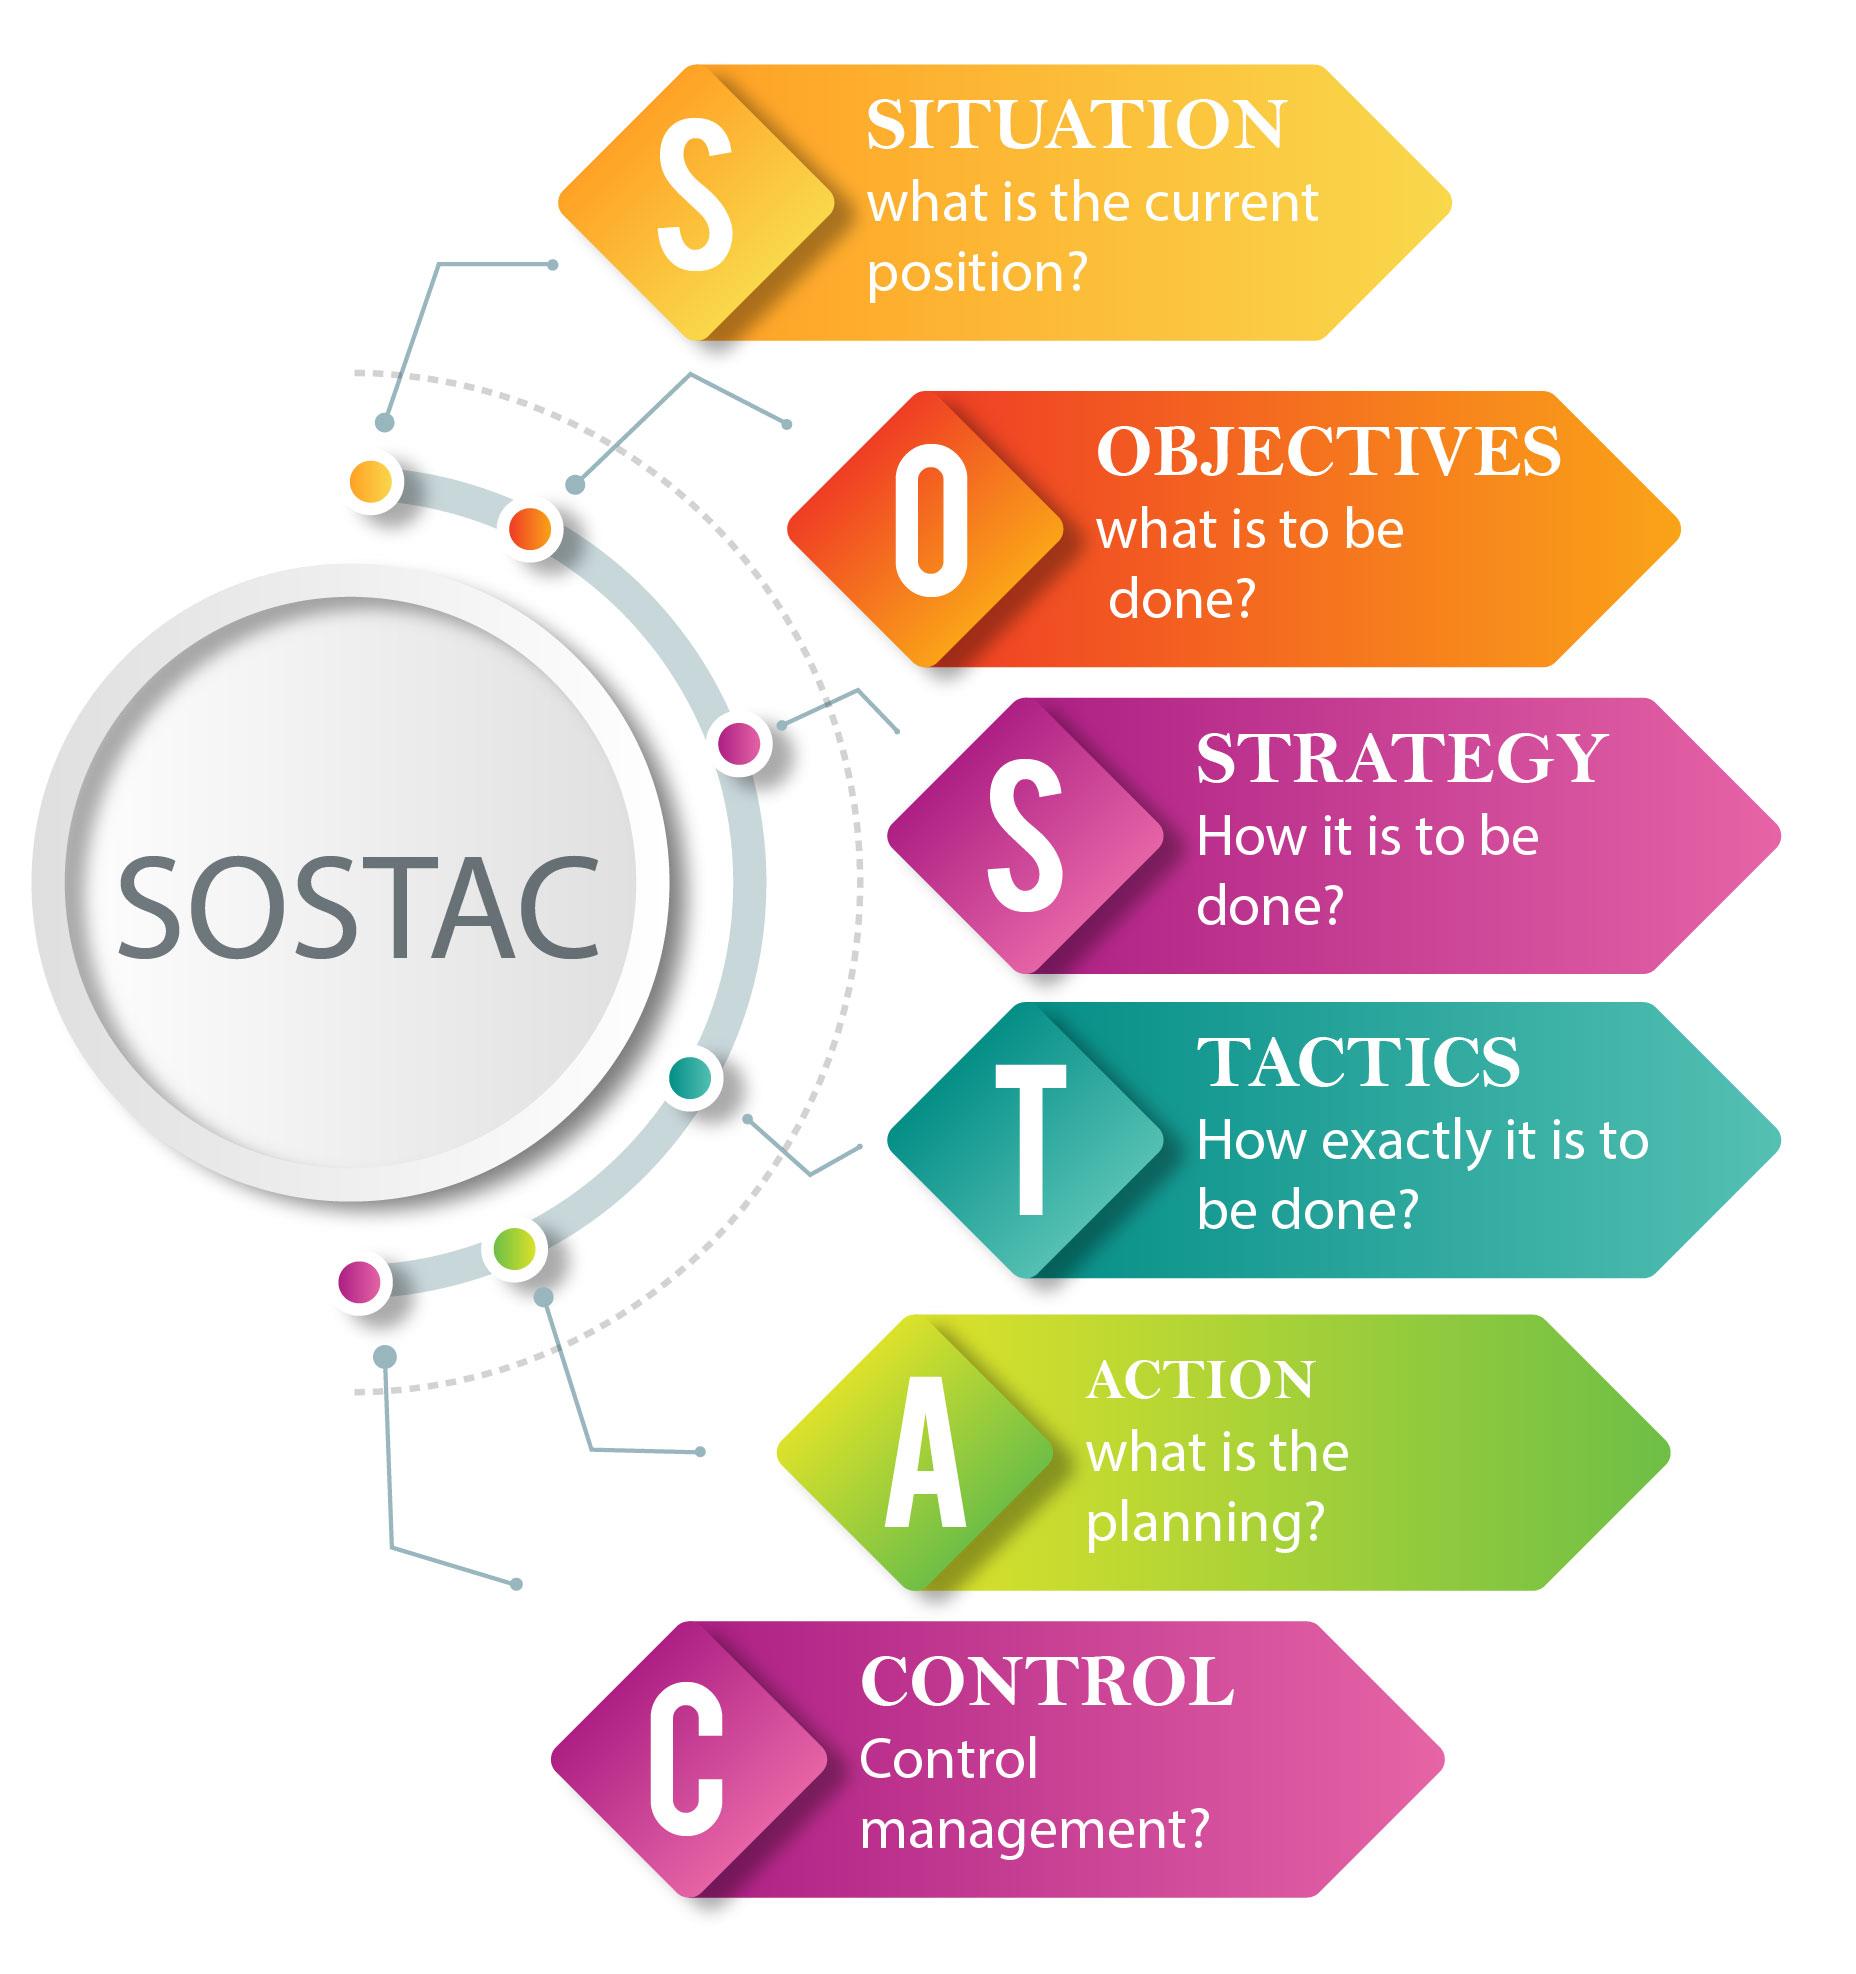 مدل بازاریابی SOSTAC